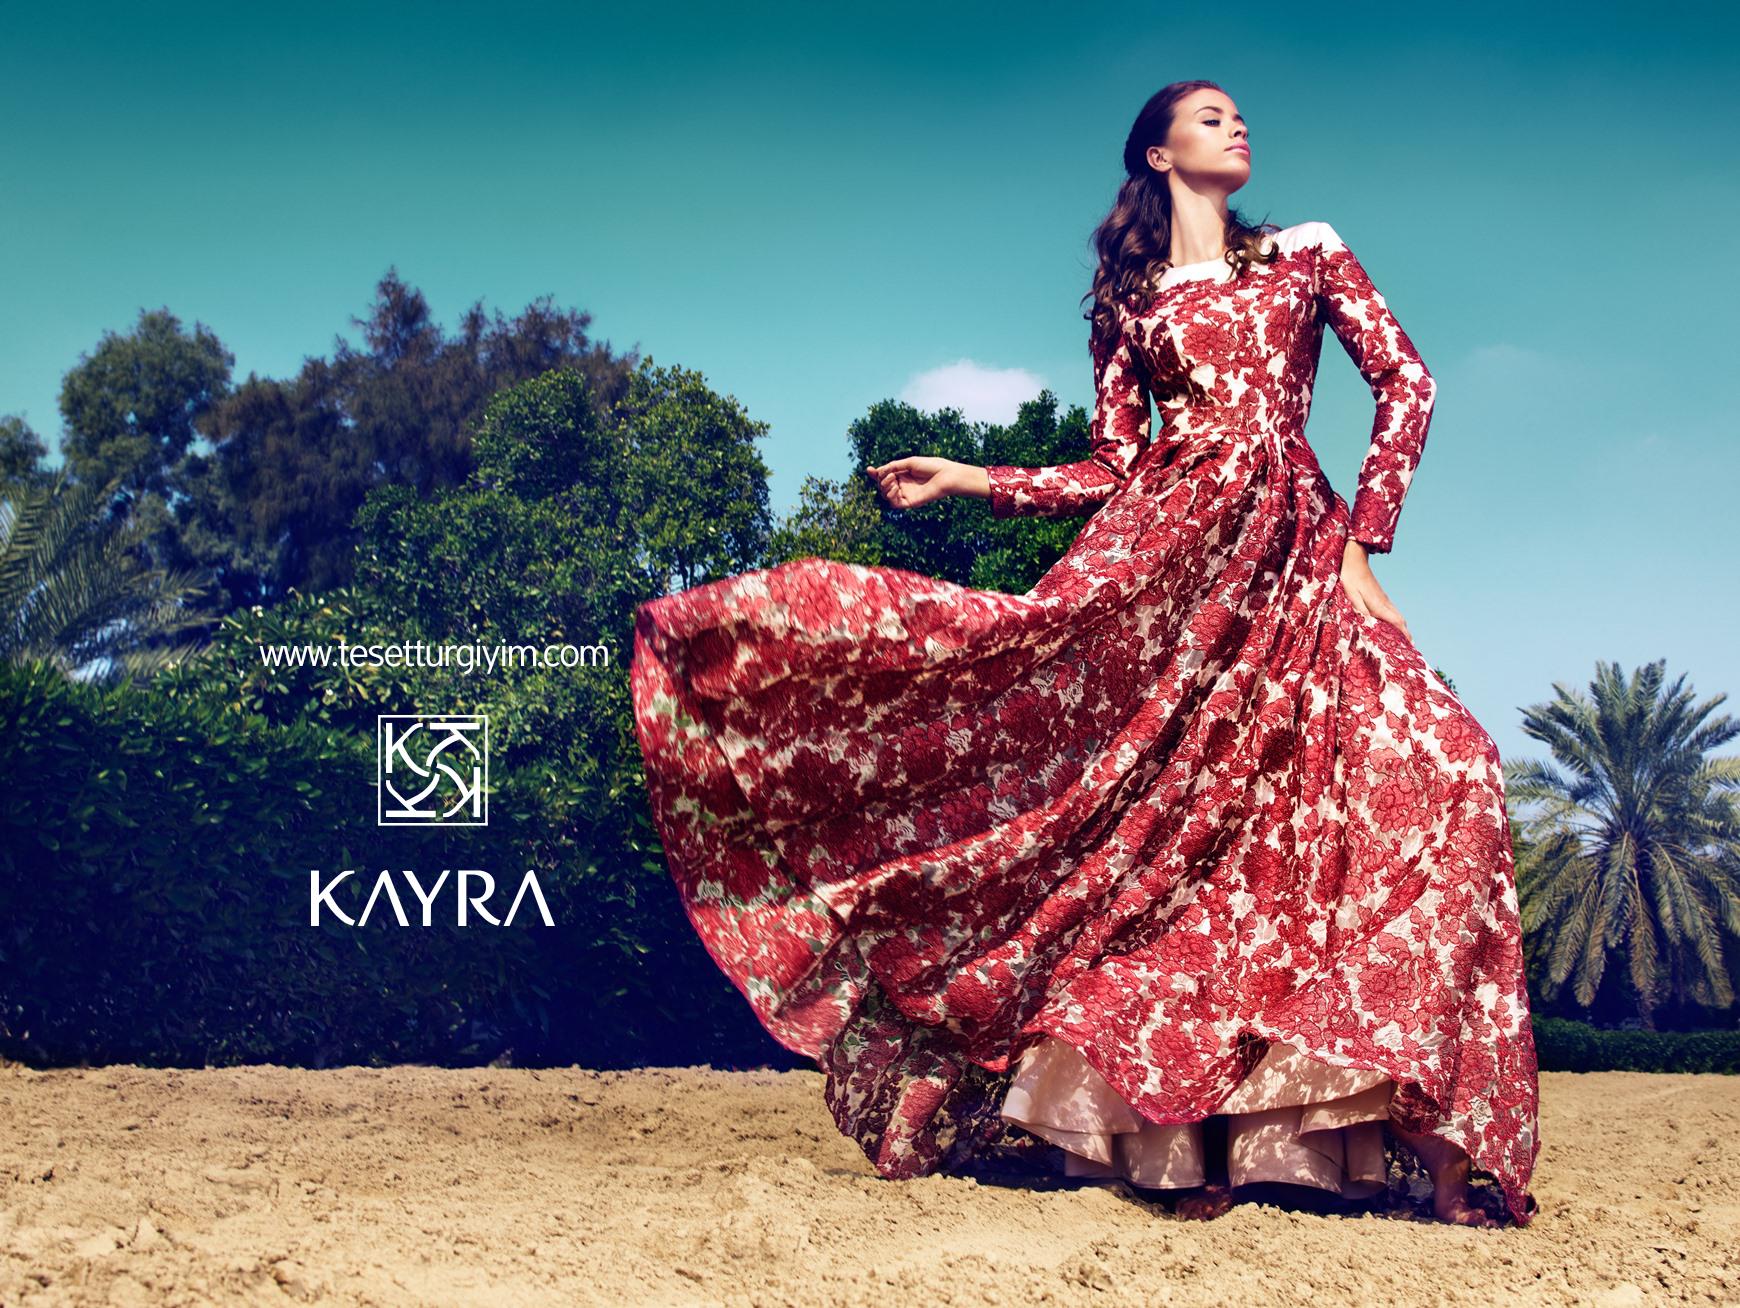 Kayra-Tesettür-Giyim-2015